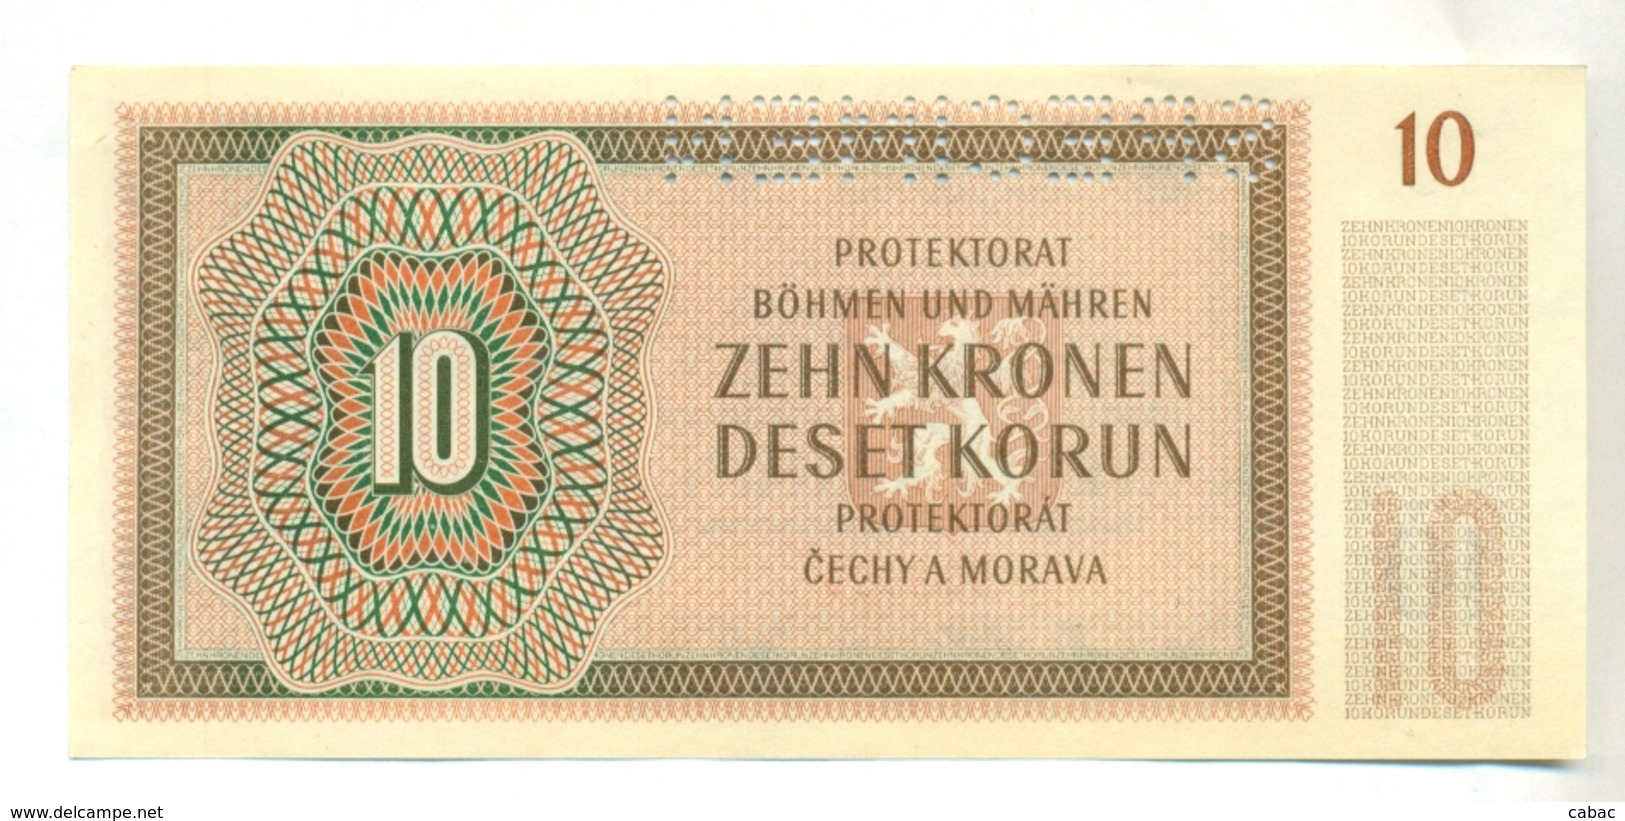 Čechya Morava, Deset Korun, 10 Korun, Zehn Kronen, PROTEKTORAT, 1942, SPECIMEN, S. 21N, Bohemia Moravia - Tchécoslovaquie